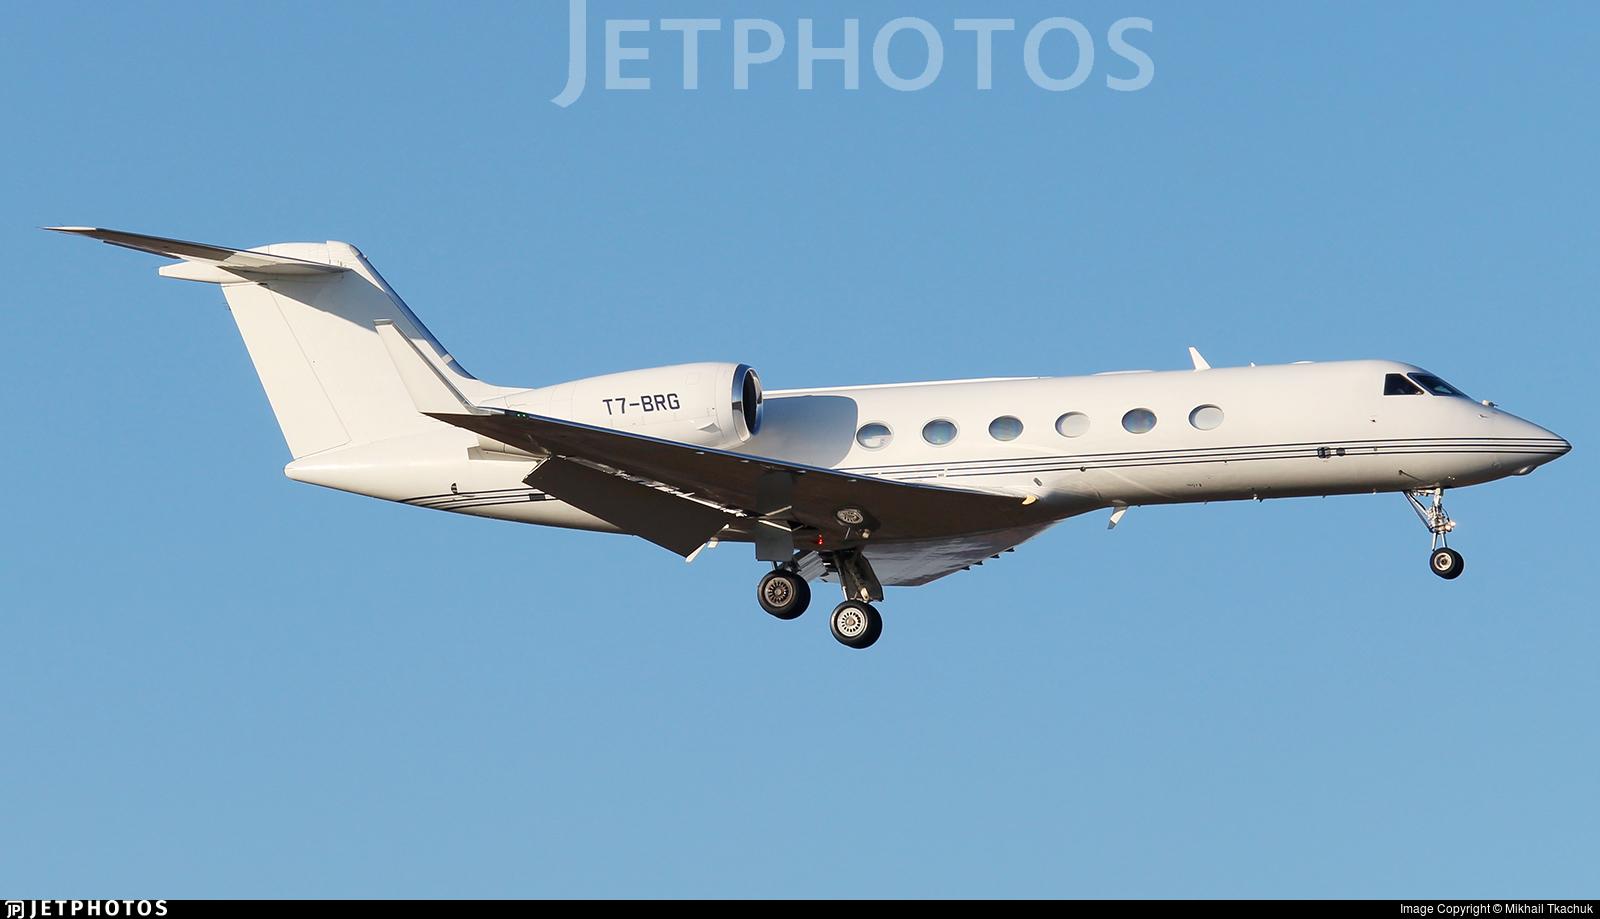 T7-BRG - Gulfstream G450 - Private